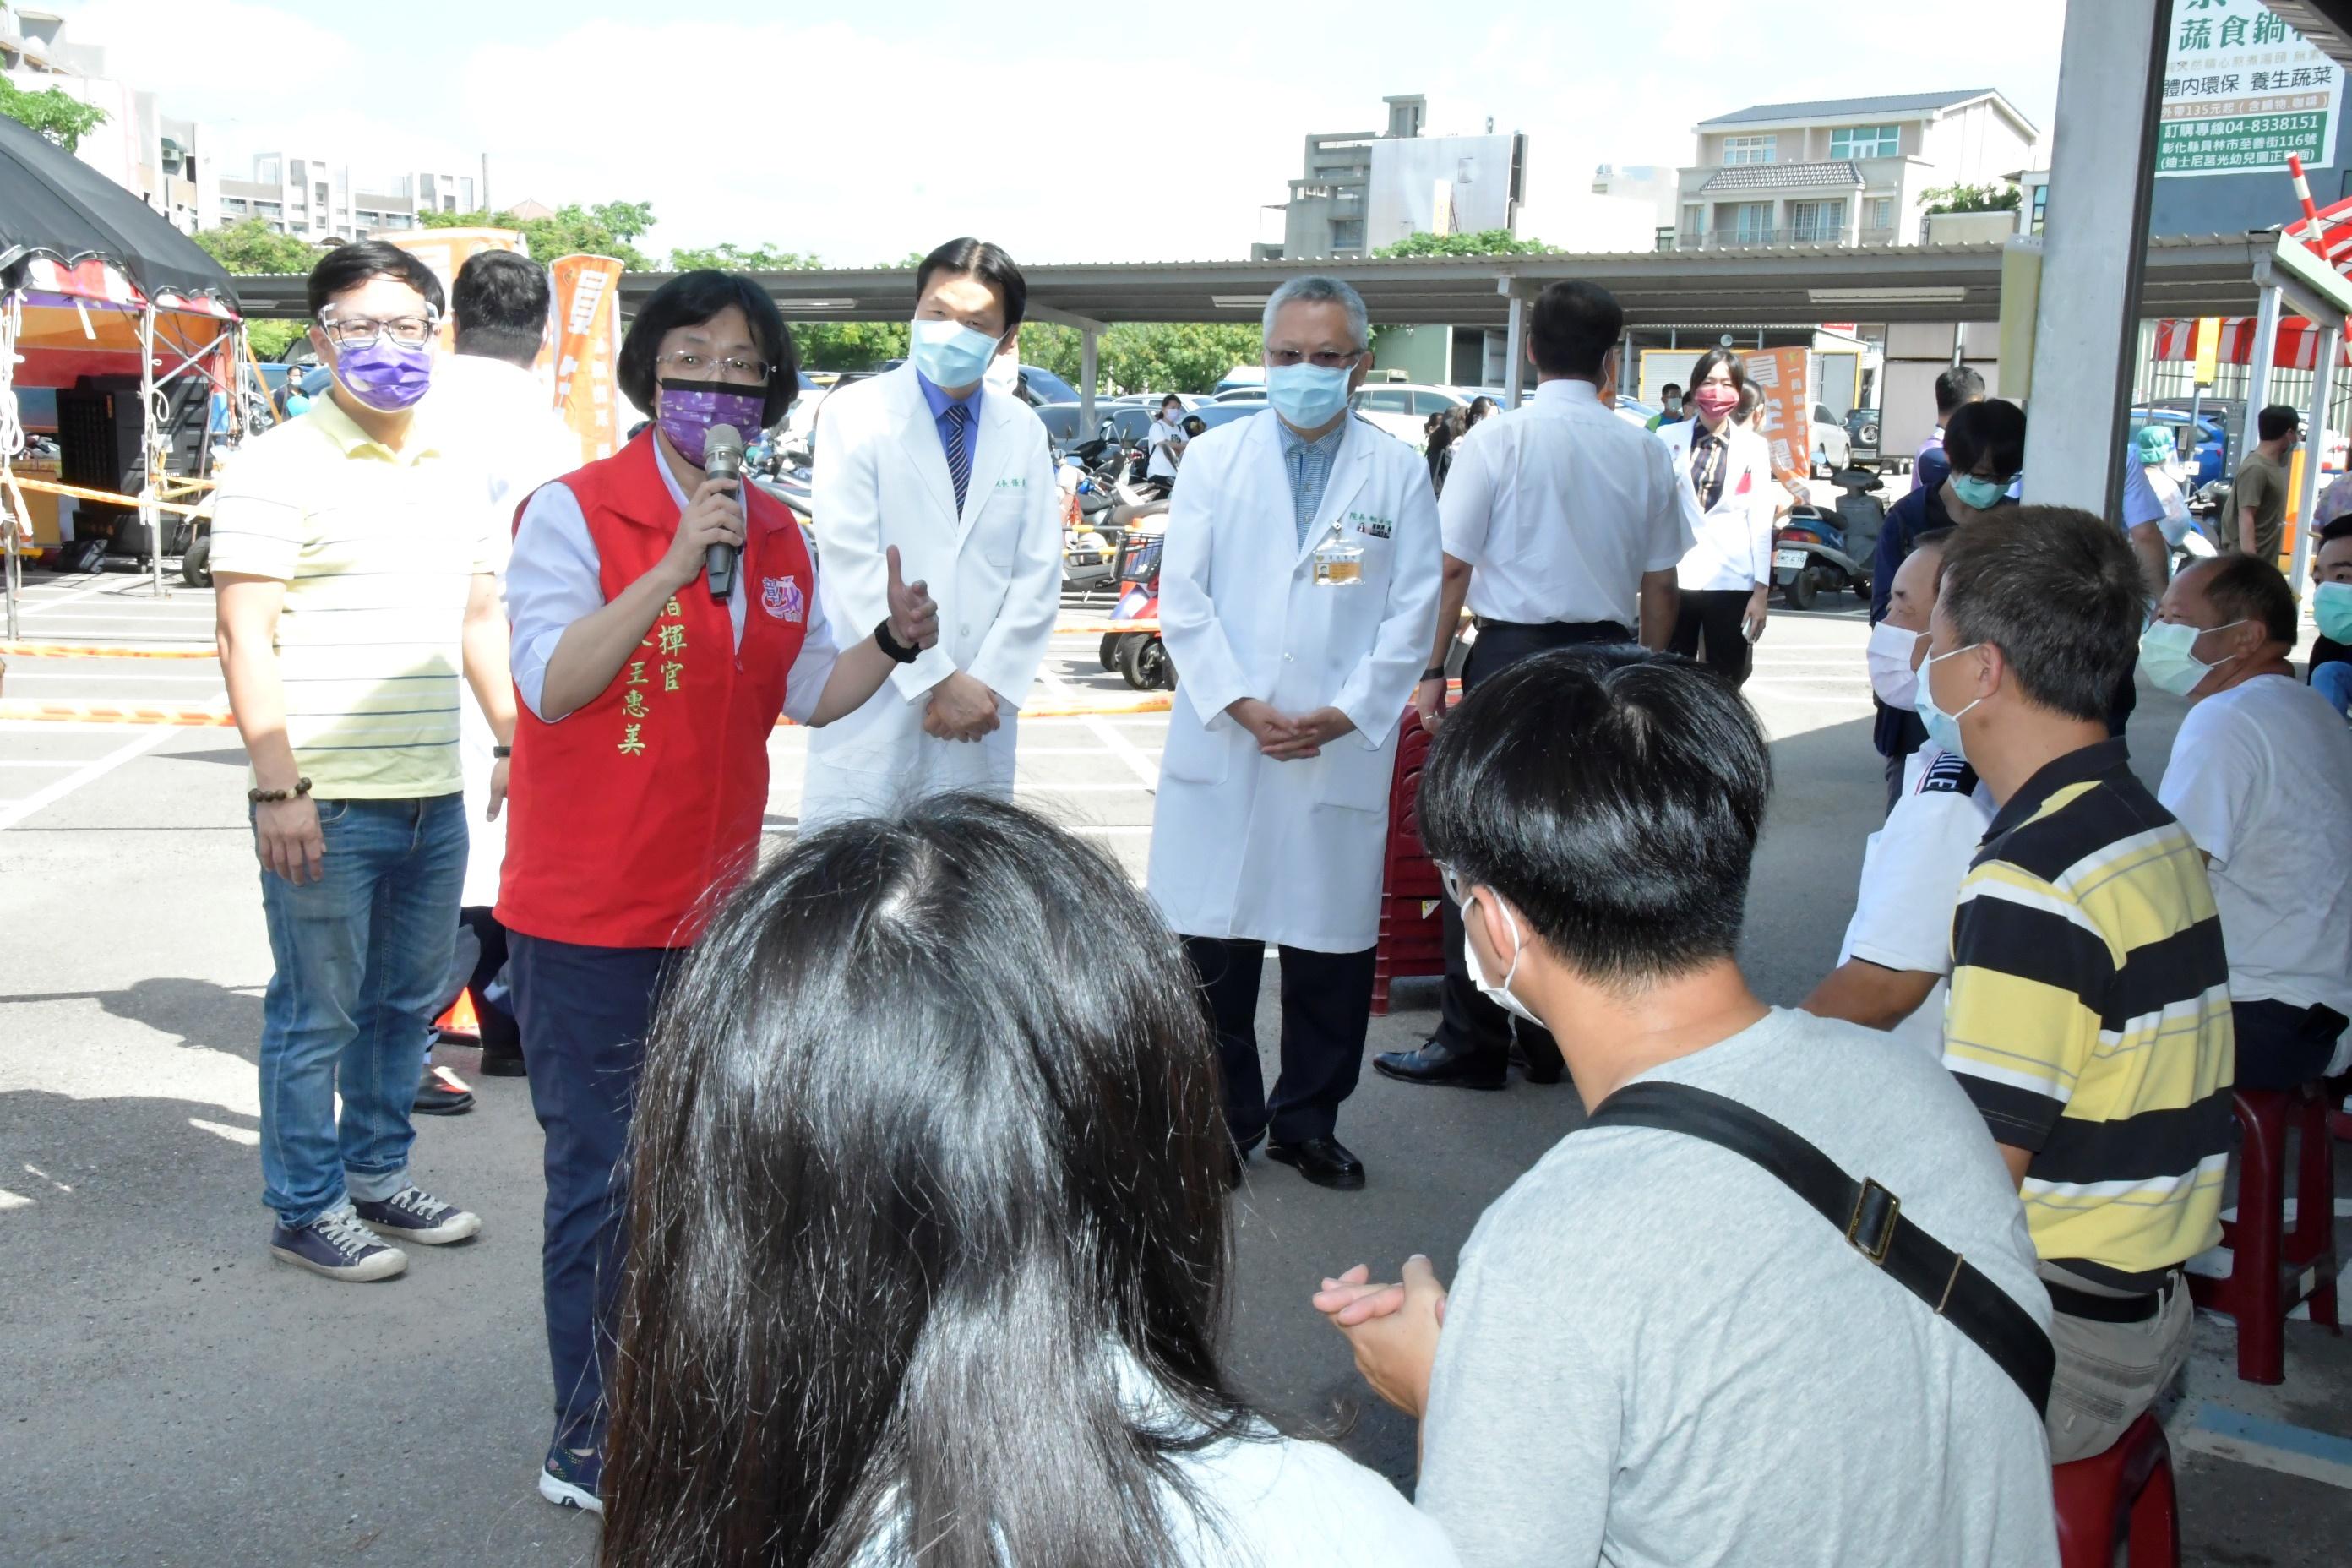 【COVID-19】前往員榮醫療體系-員生醫院關心視察 彰化果菜市場、肉品市場人員施打疫苗情形